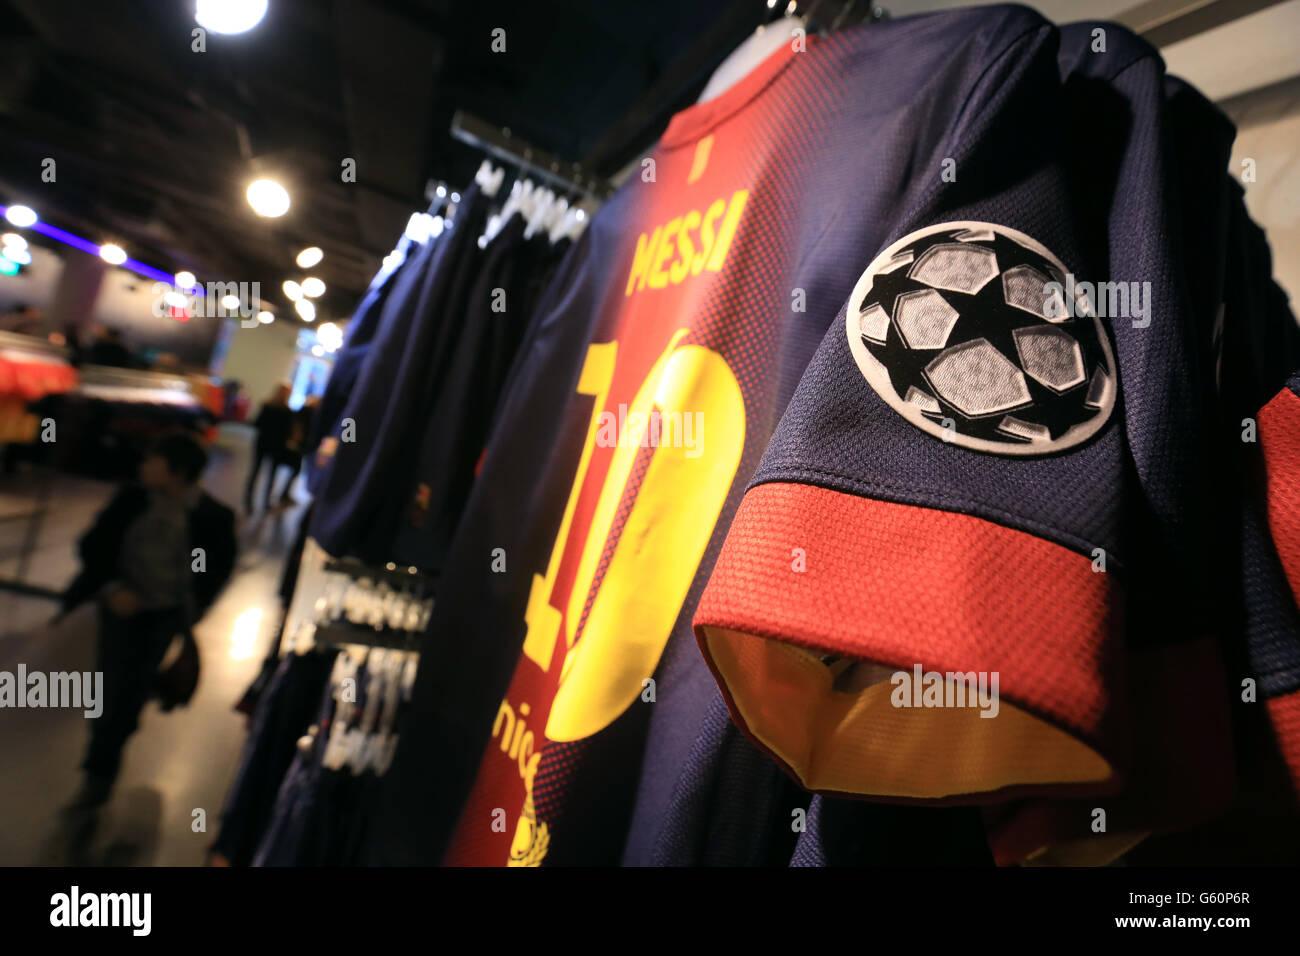 Soccer - UEFA Champions League - Round of 16 - Second Leg - Barcelona v AC Milan - Nou Camp - Stock Image